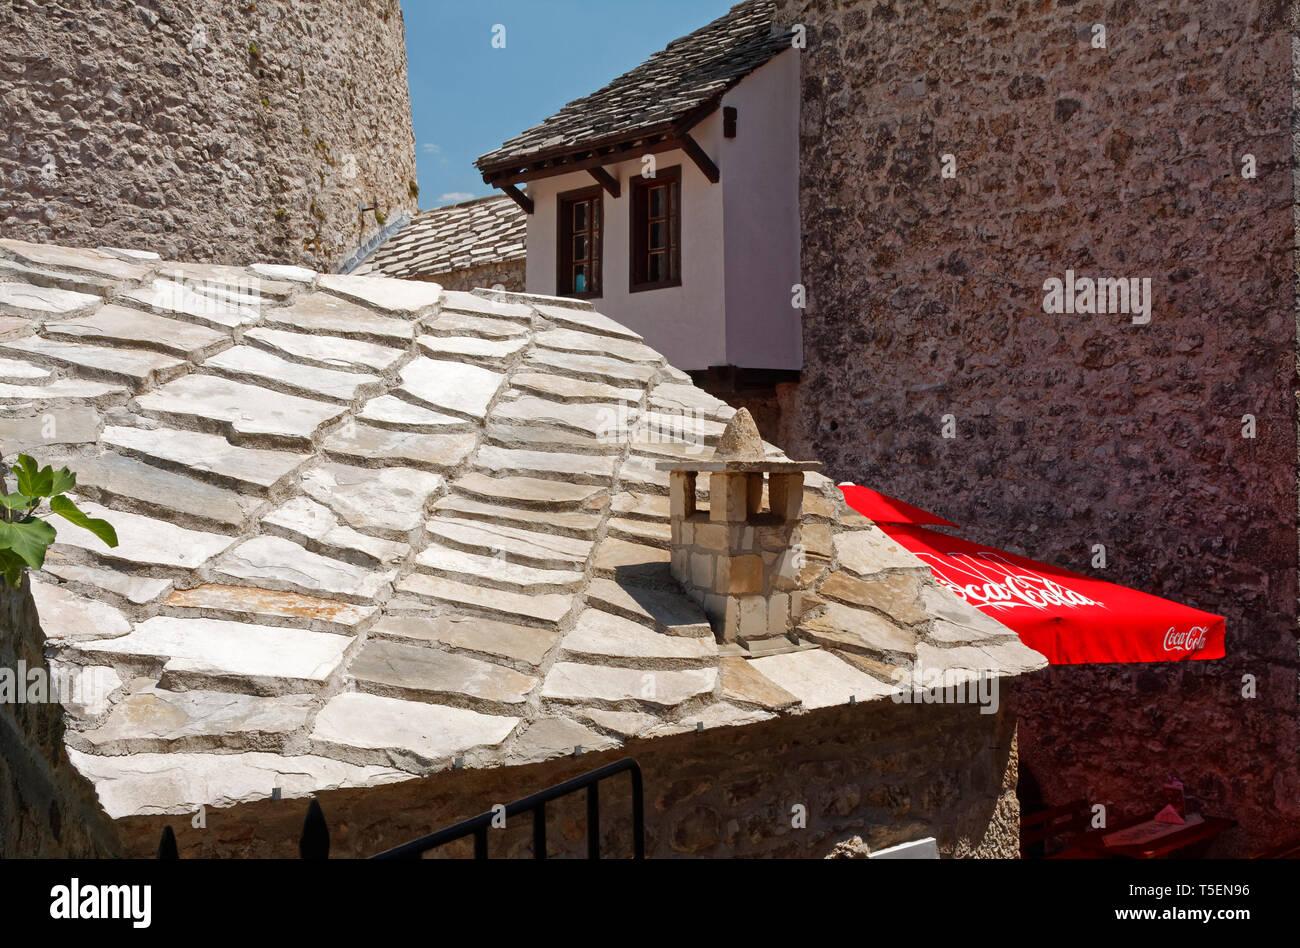 stone slab roof; heavy, old buildings; new red Coca Cola umbrella, contrast, Europe, Mostar; Bosnia Herzegovina;  summer, horizontal - Stock Image